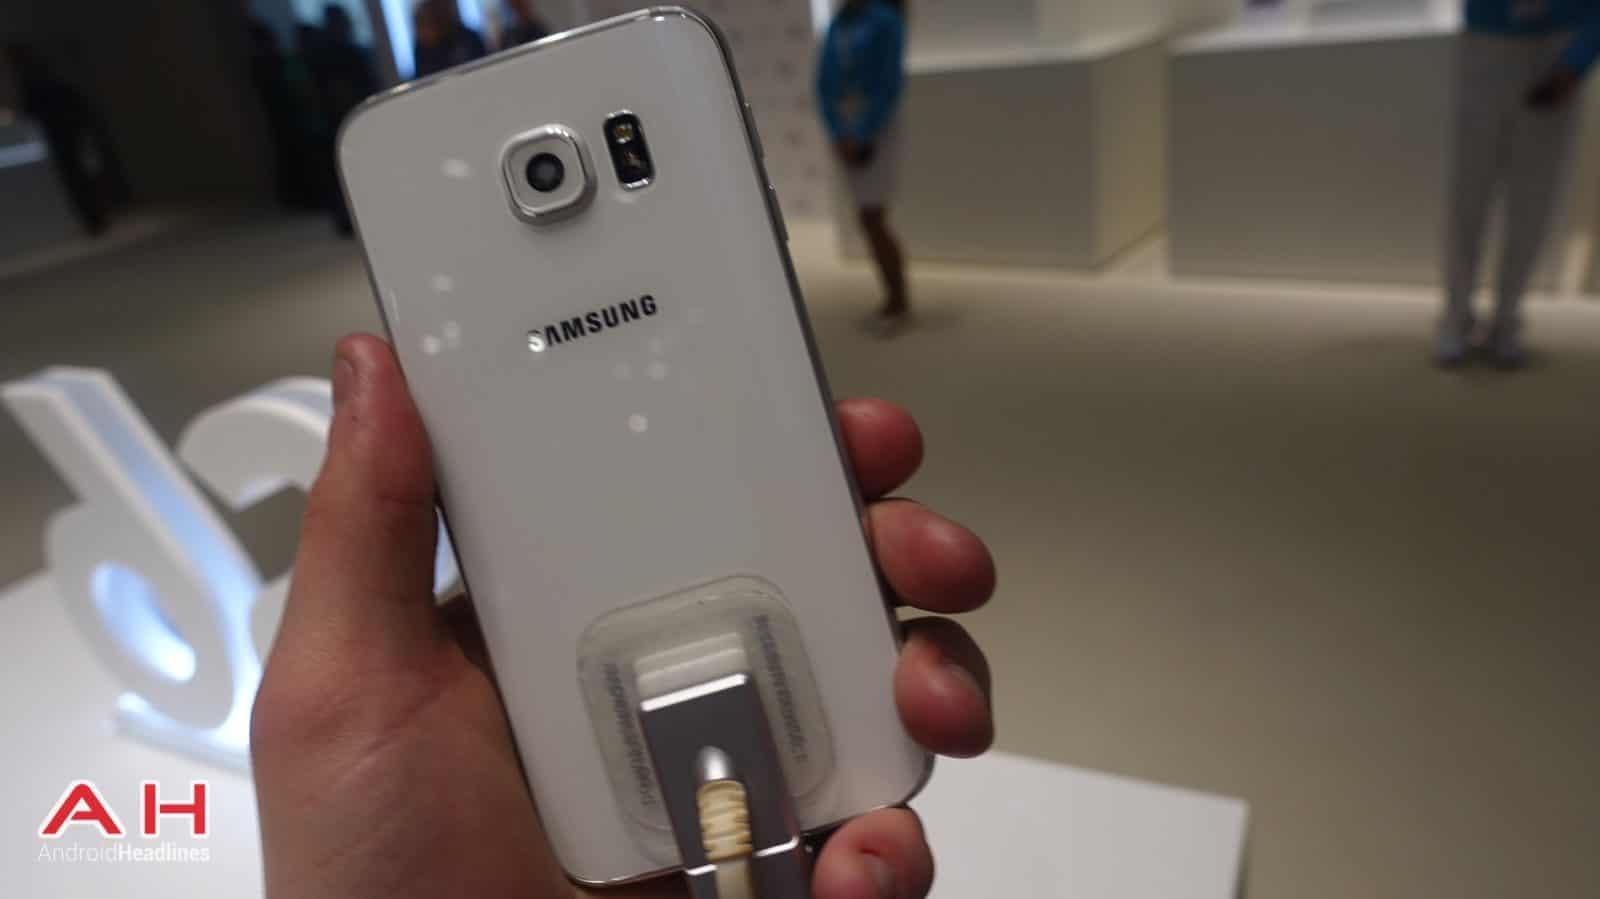 Galaxy S6 and Galaxy S6 Edge MWC AH 05